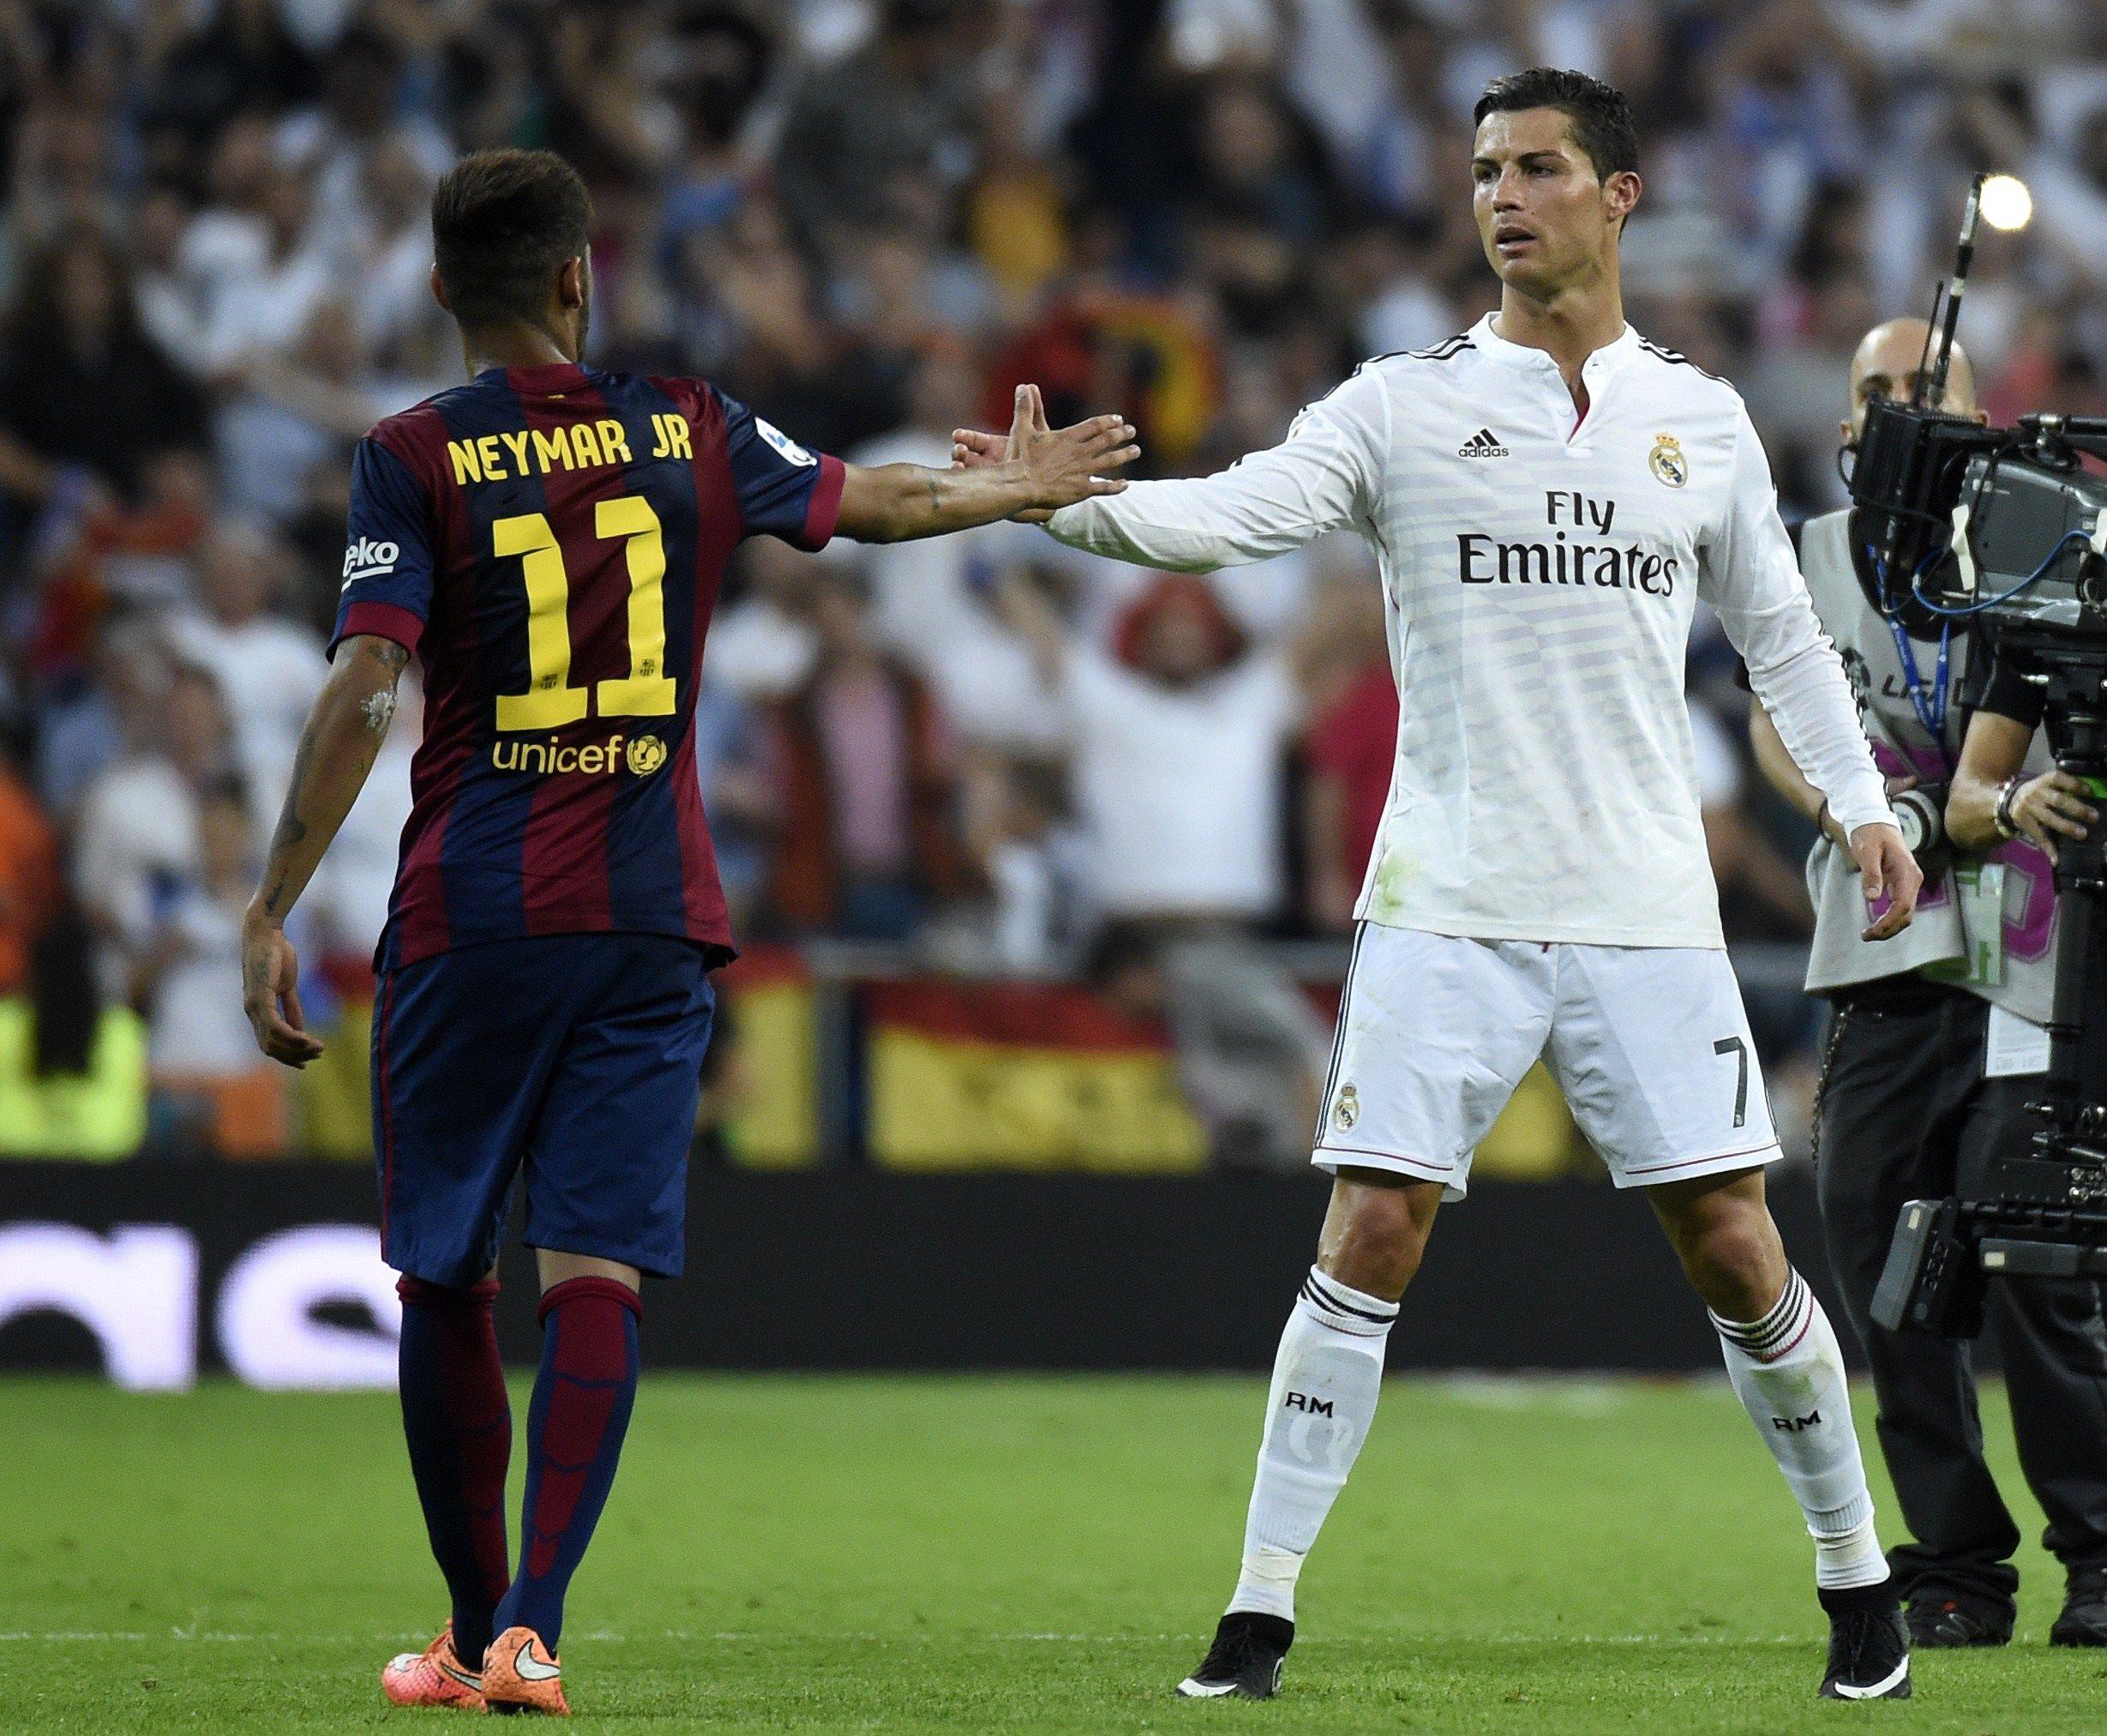 El Clasico Preview Barcelona Vs Real Madrid Prosoccertalk Nbc Sports Neymar Cristiano Ronaldo Ronaldo